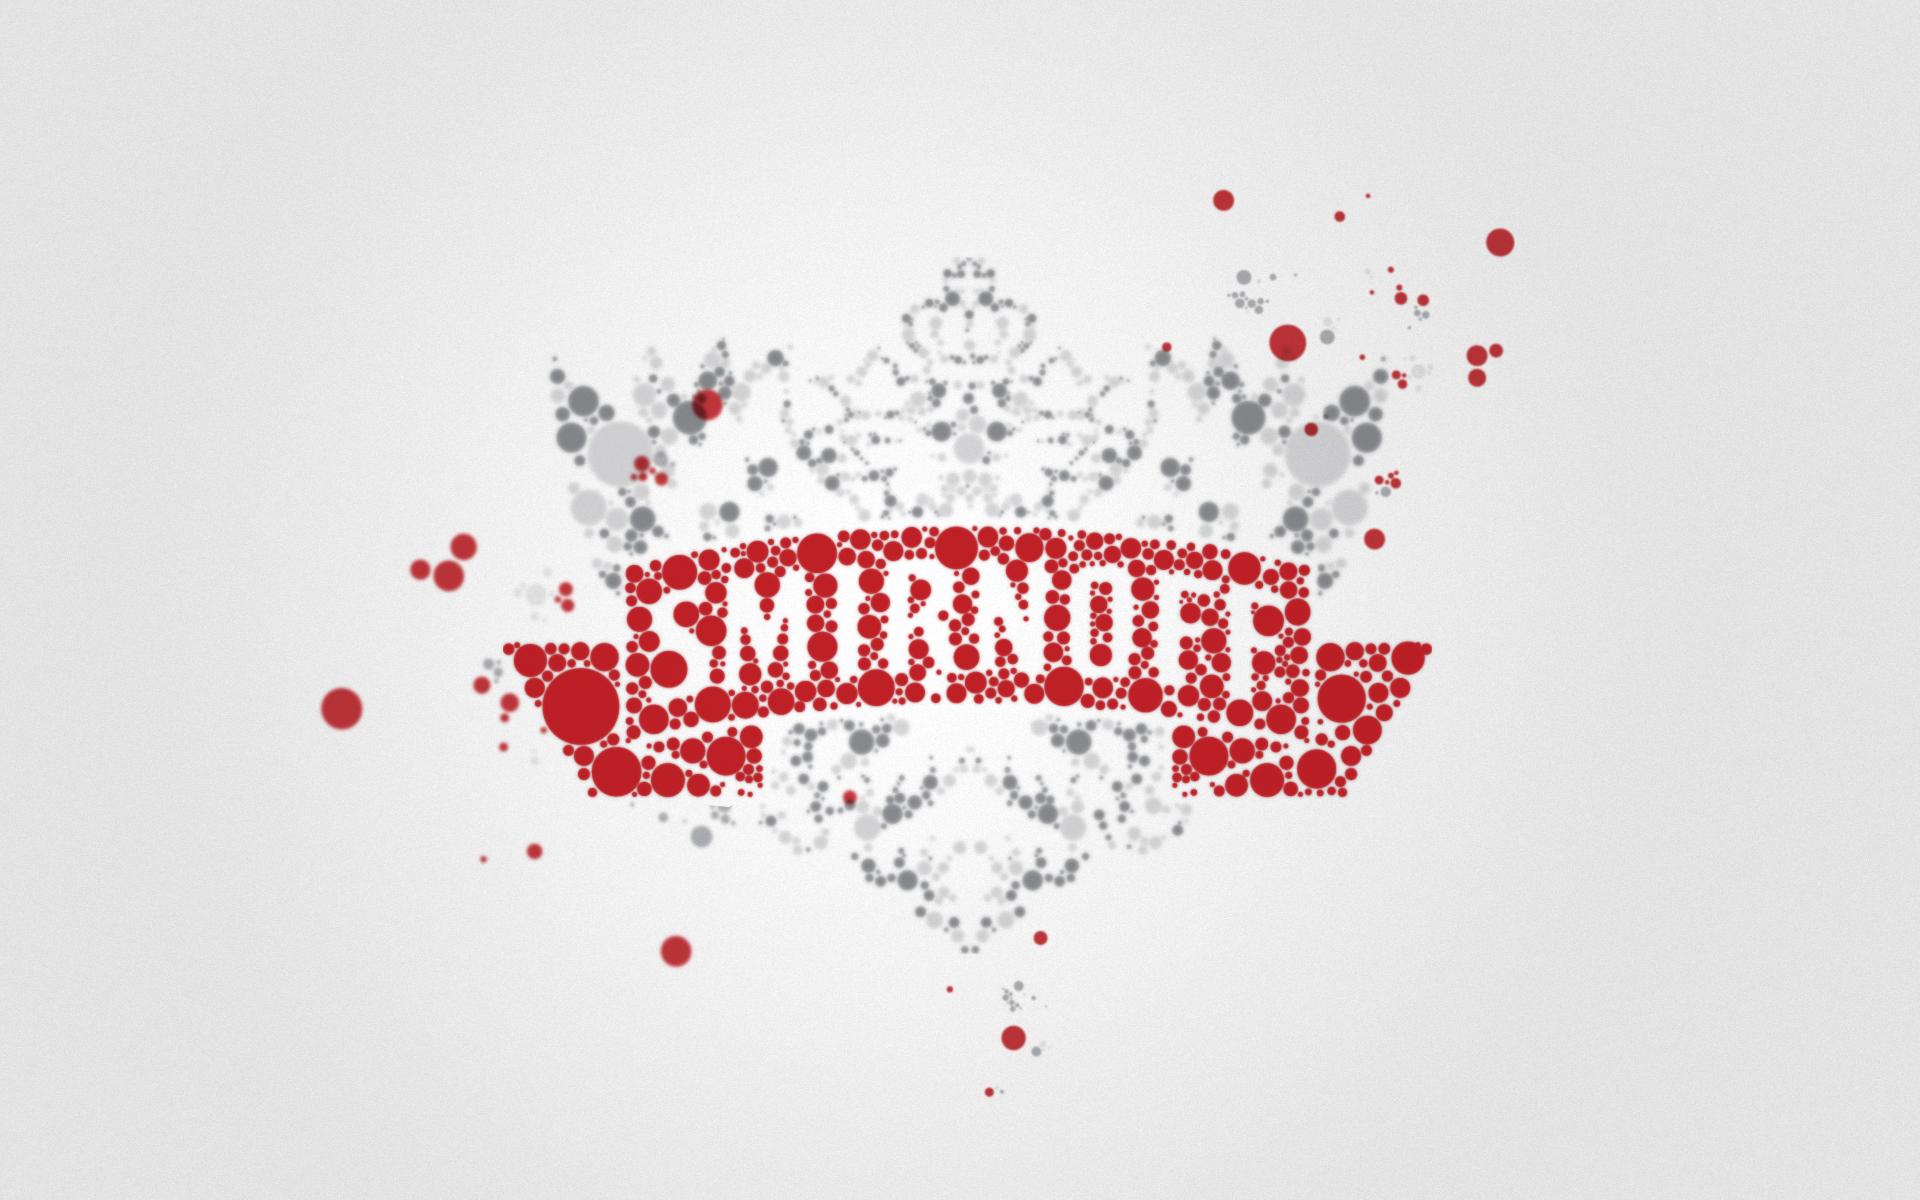 smirnoff_be_there_01.jpg